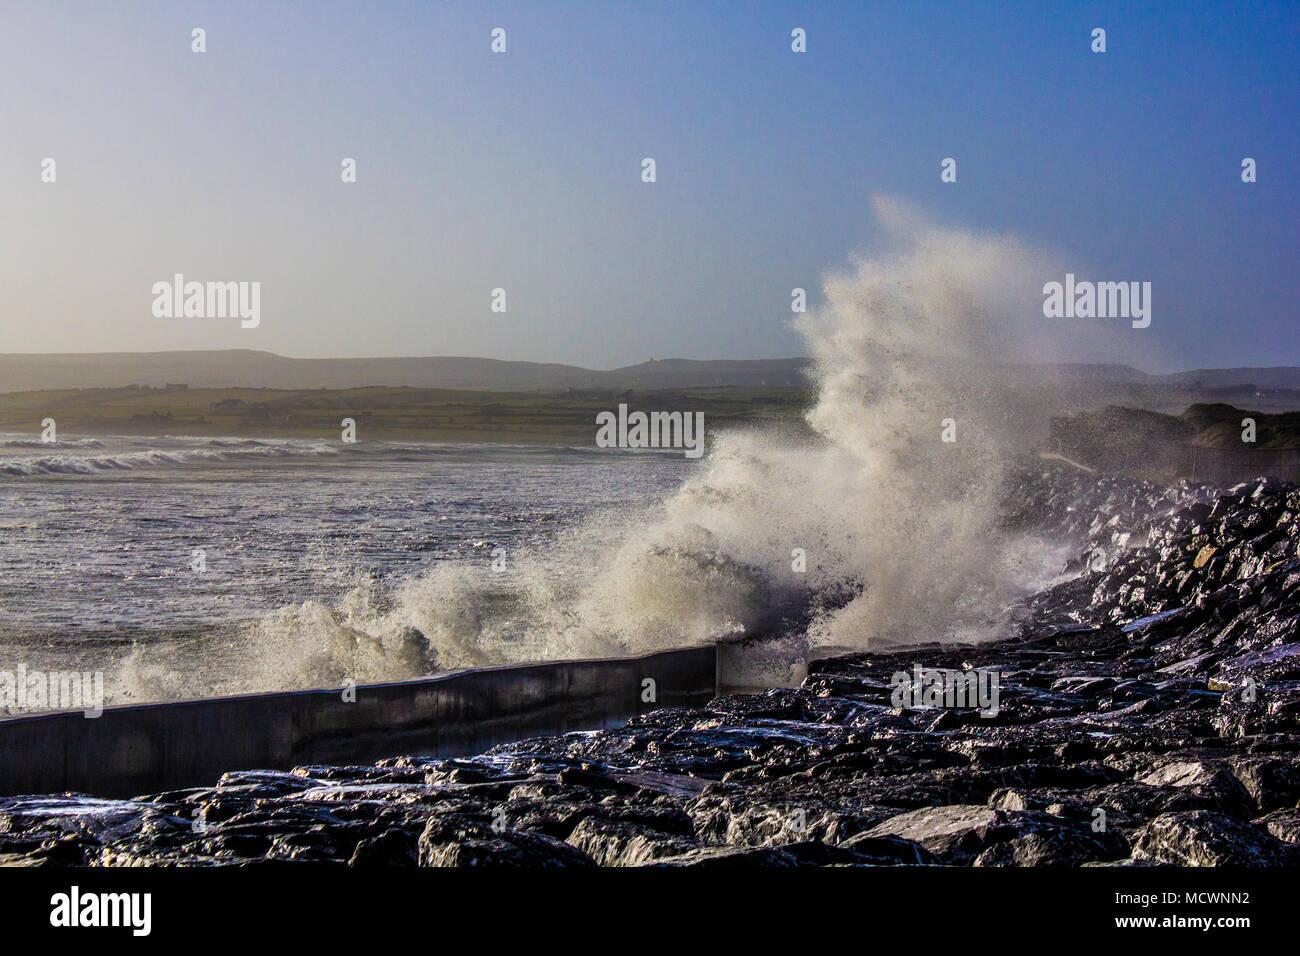 Wave crashing into wall at Lahinch beach during high tide causing big splash - Stock Image